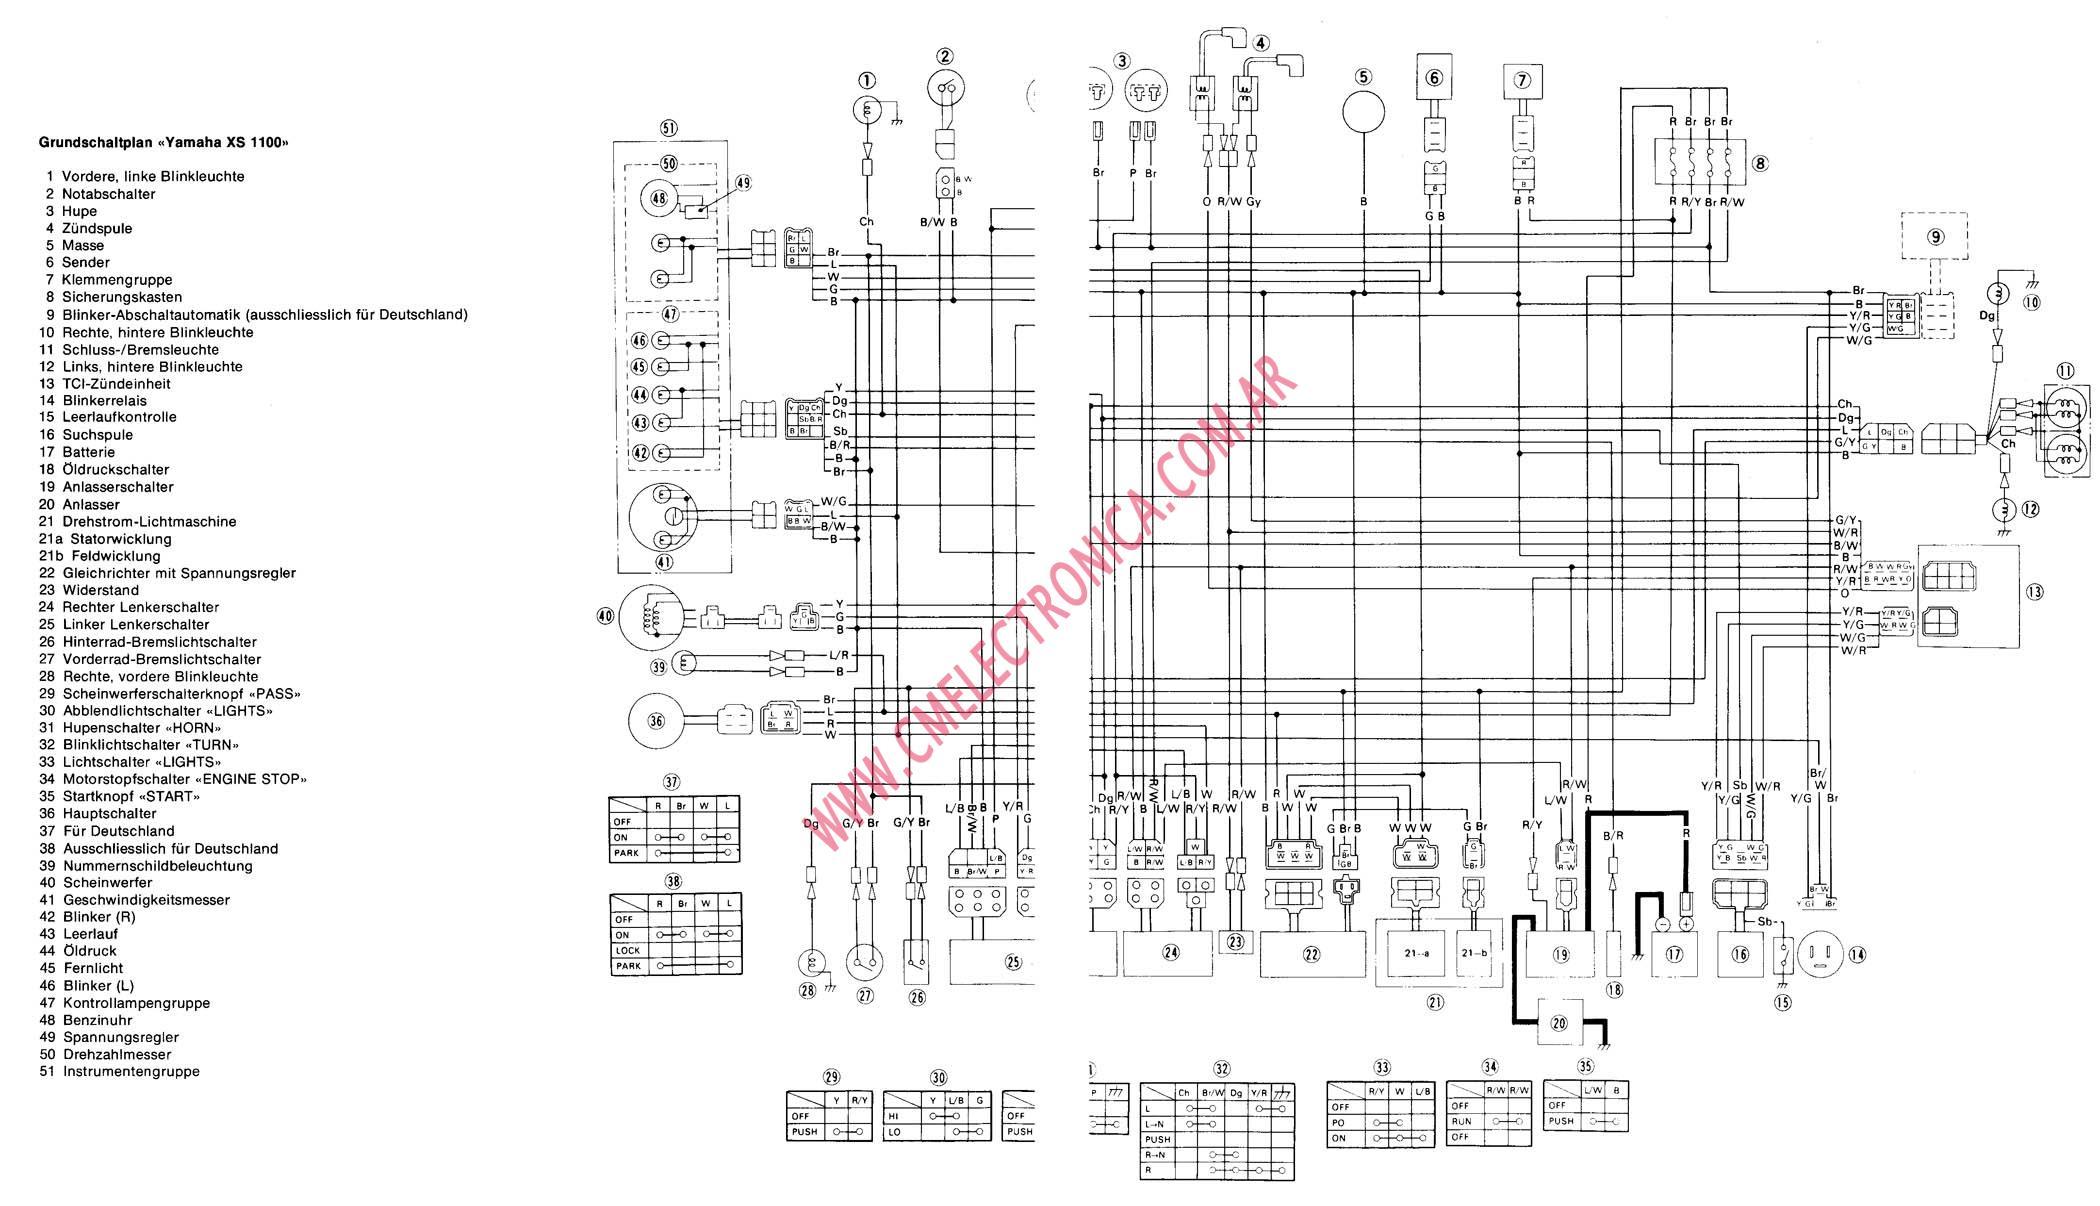 Yamaha Xs11 Wiring Diagram - wiring diagram sockets-page -  sockets-page.albergoinsicilia.it | 1979 Yamaha Xs1100 Wiring Diagram |  | sockets-page.albergoinsicilia.it